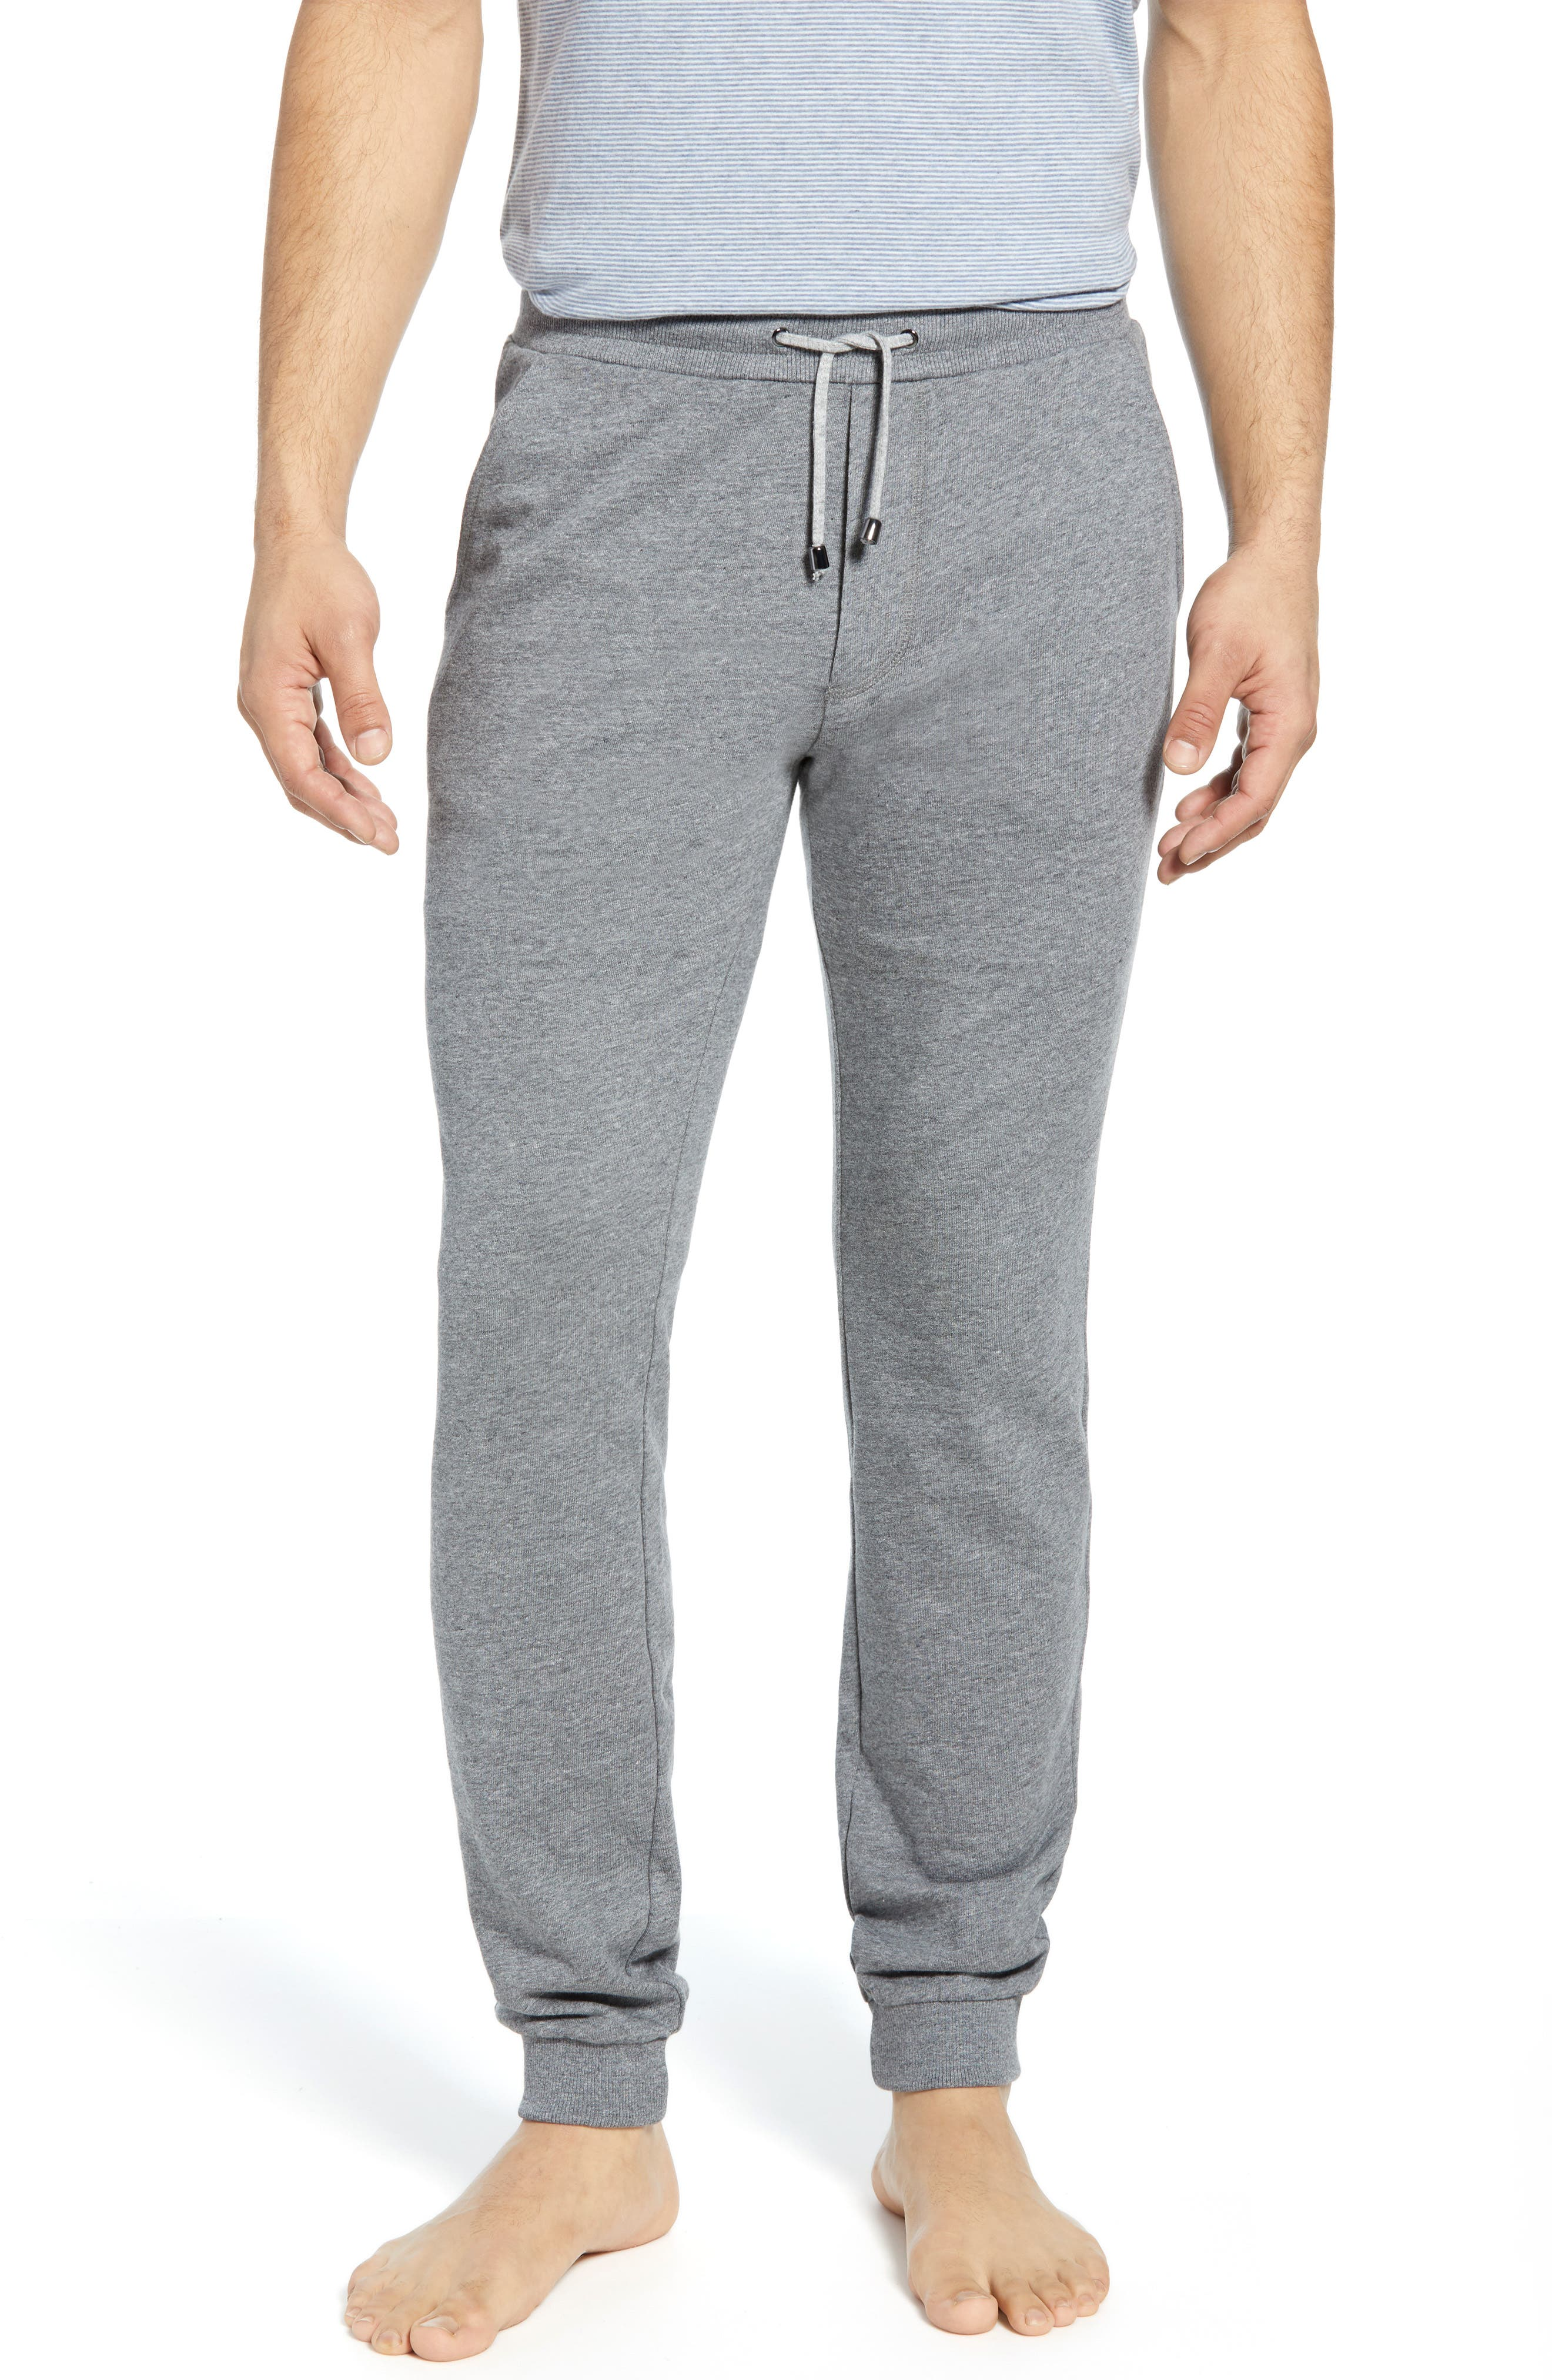 ROBERT BARAKETT Marshall Lounge Pants, Main, color, 030